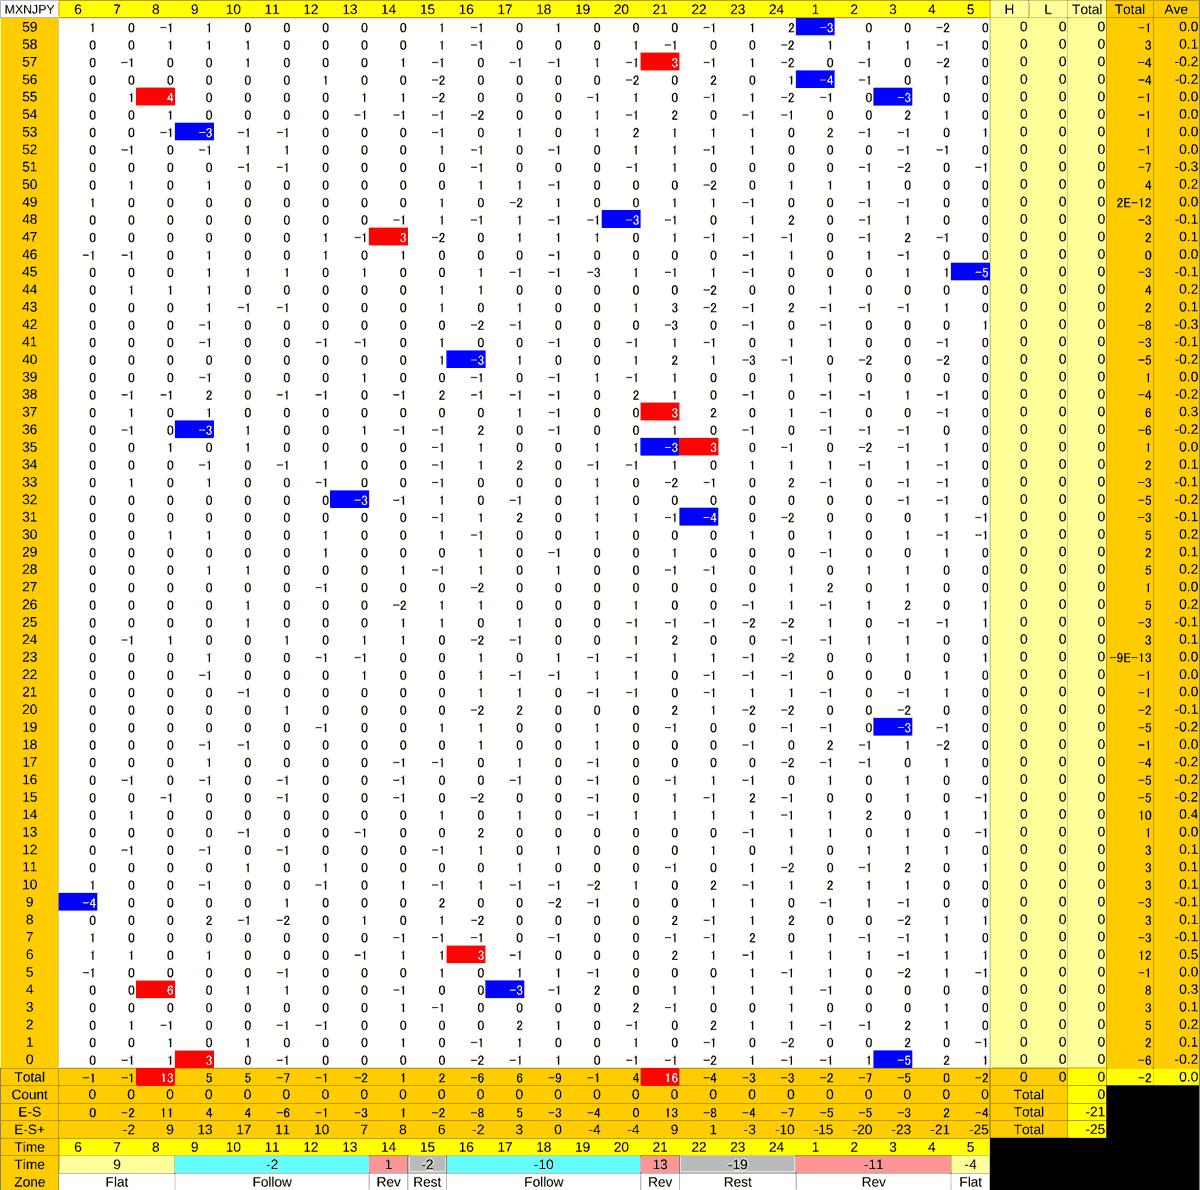 20200826_HS(3)MXNJPY